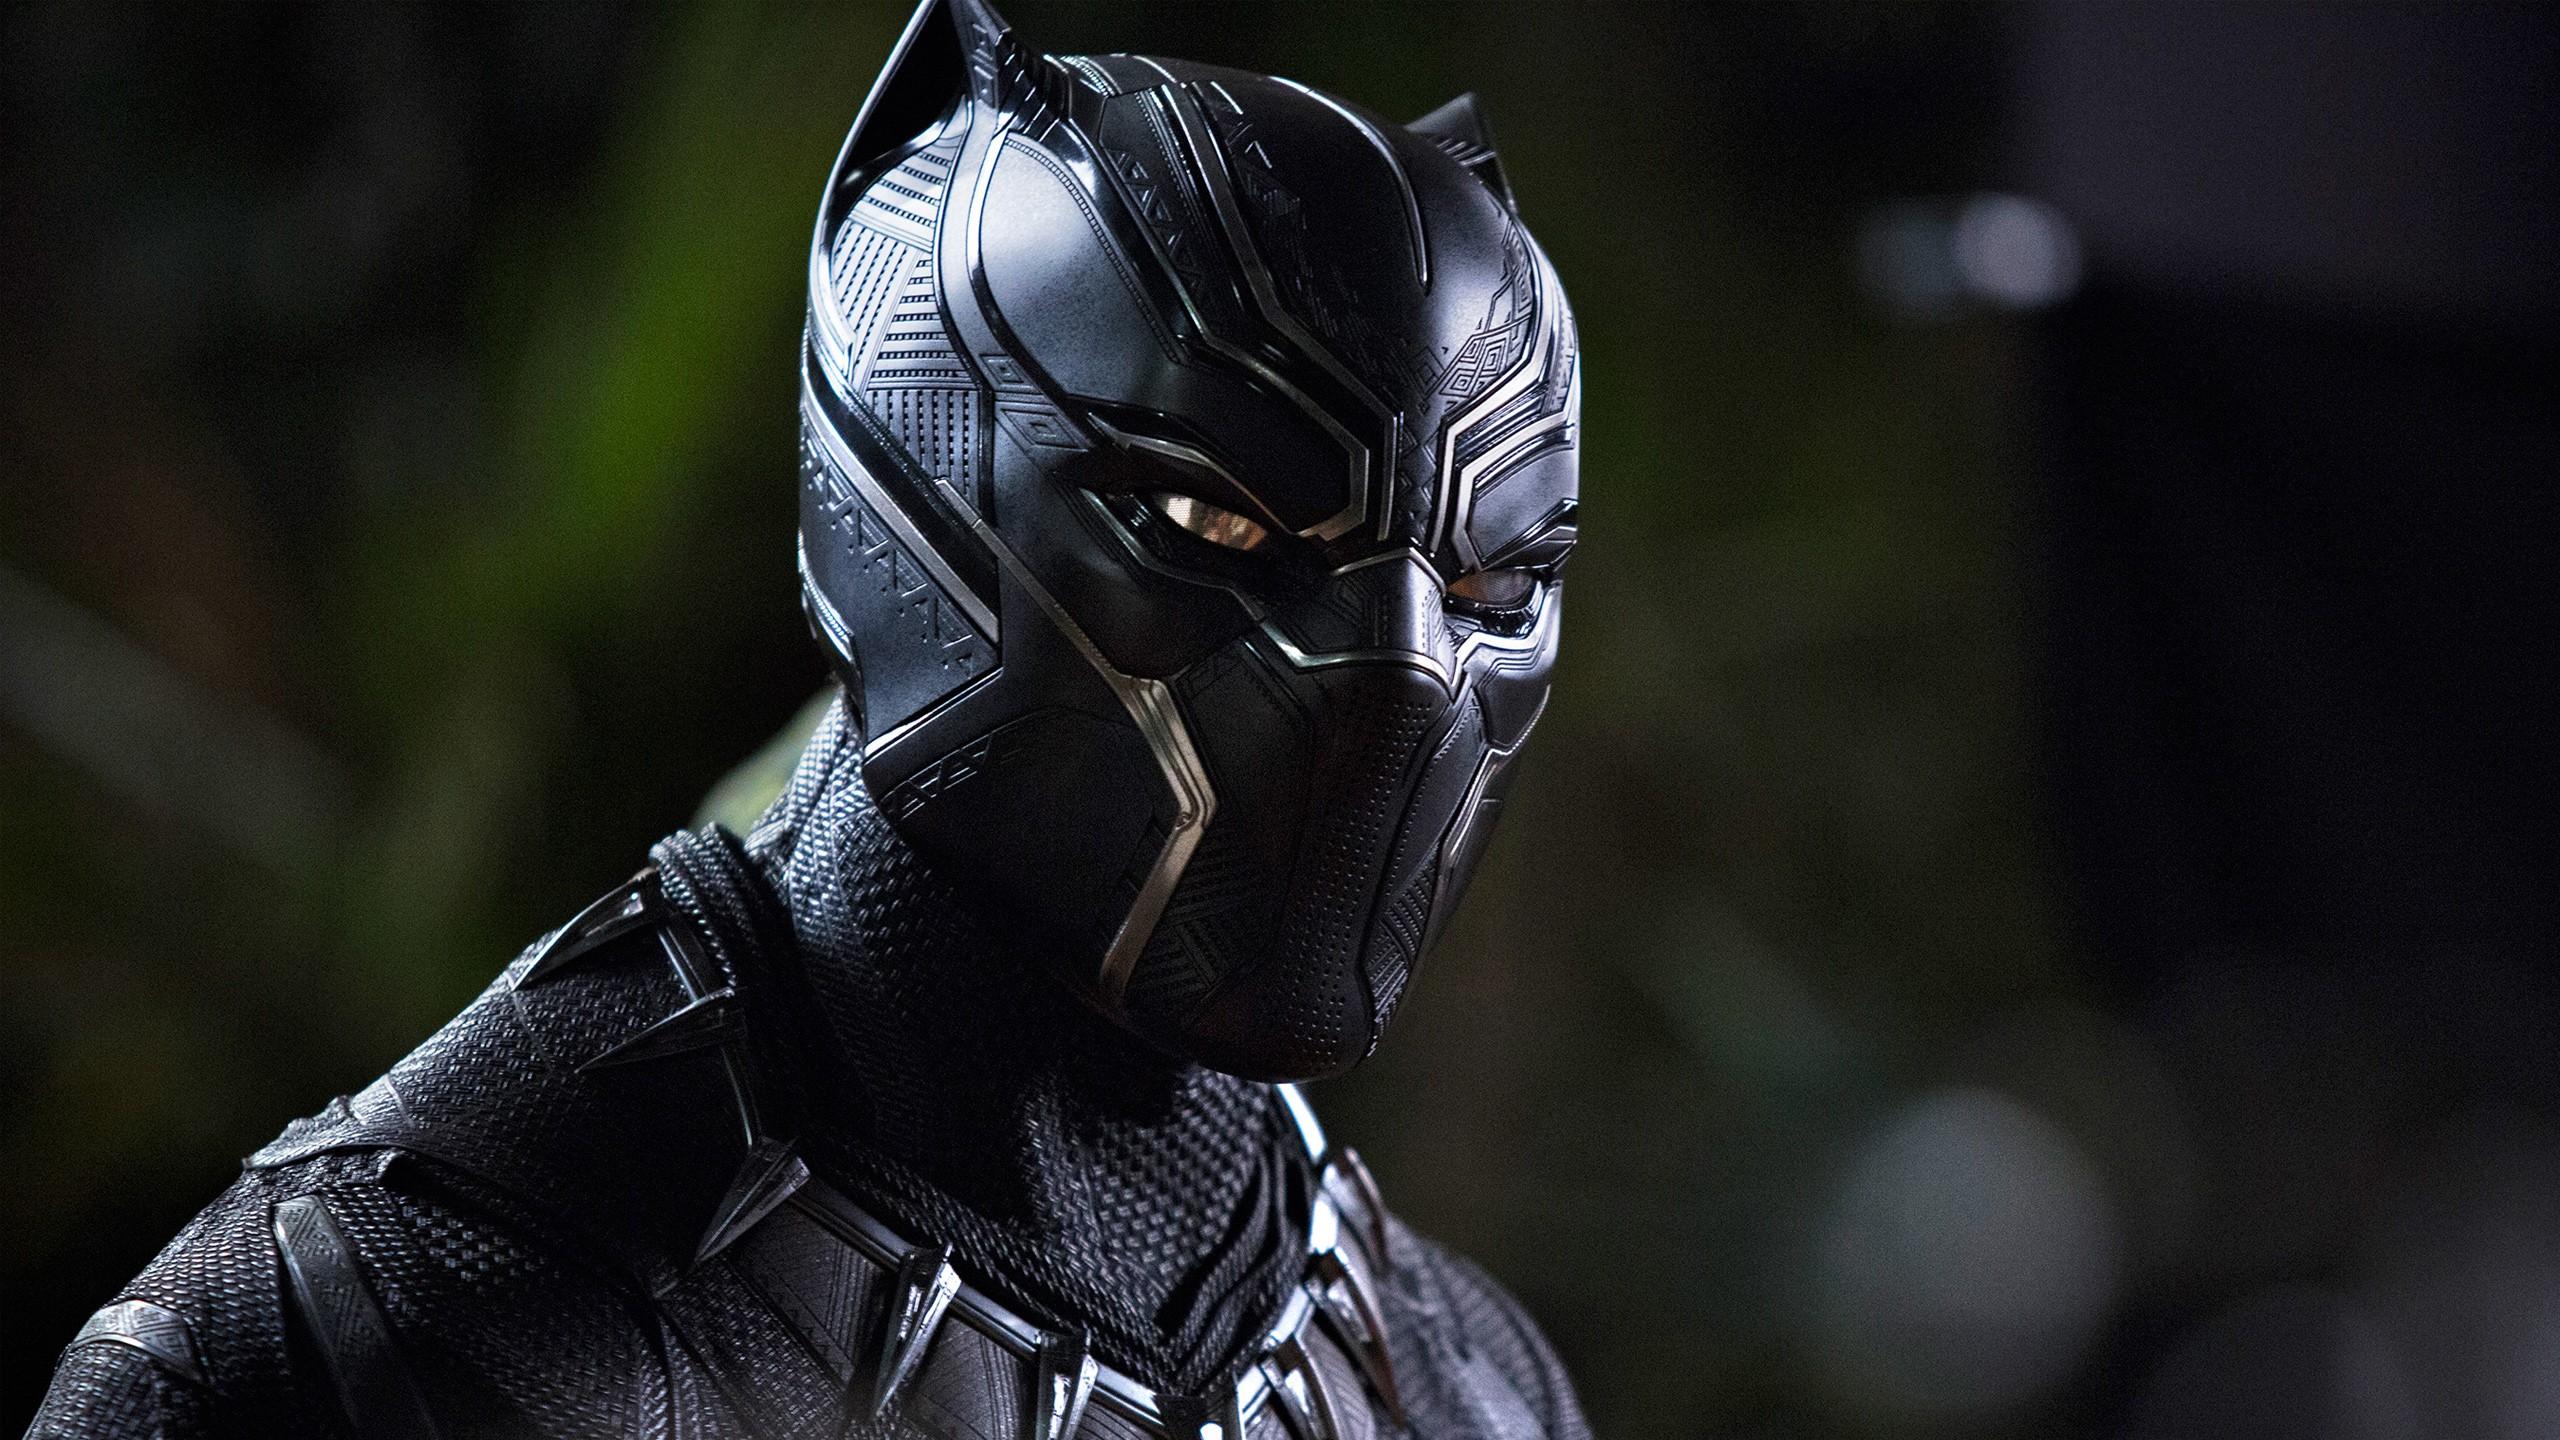 Black Panther Hd Wallpaper Hd Wallpapers